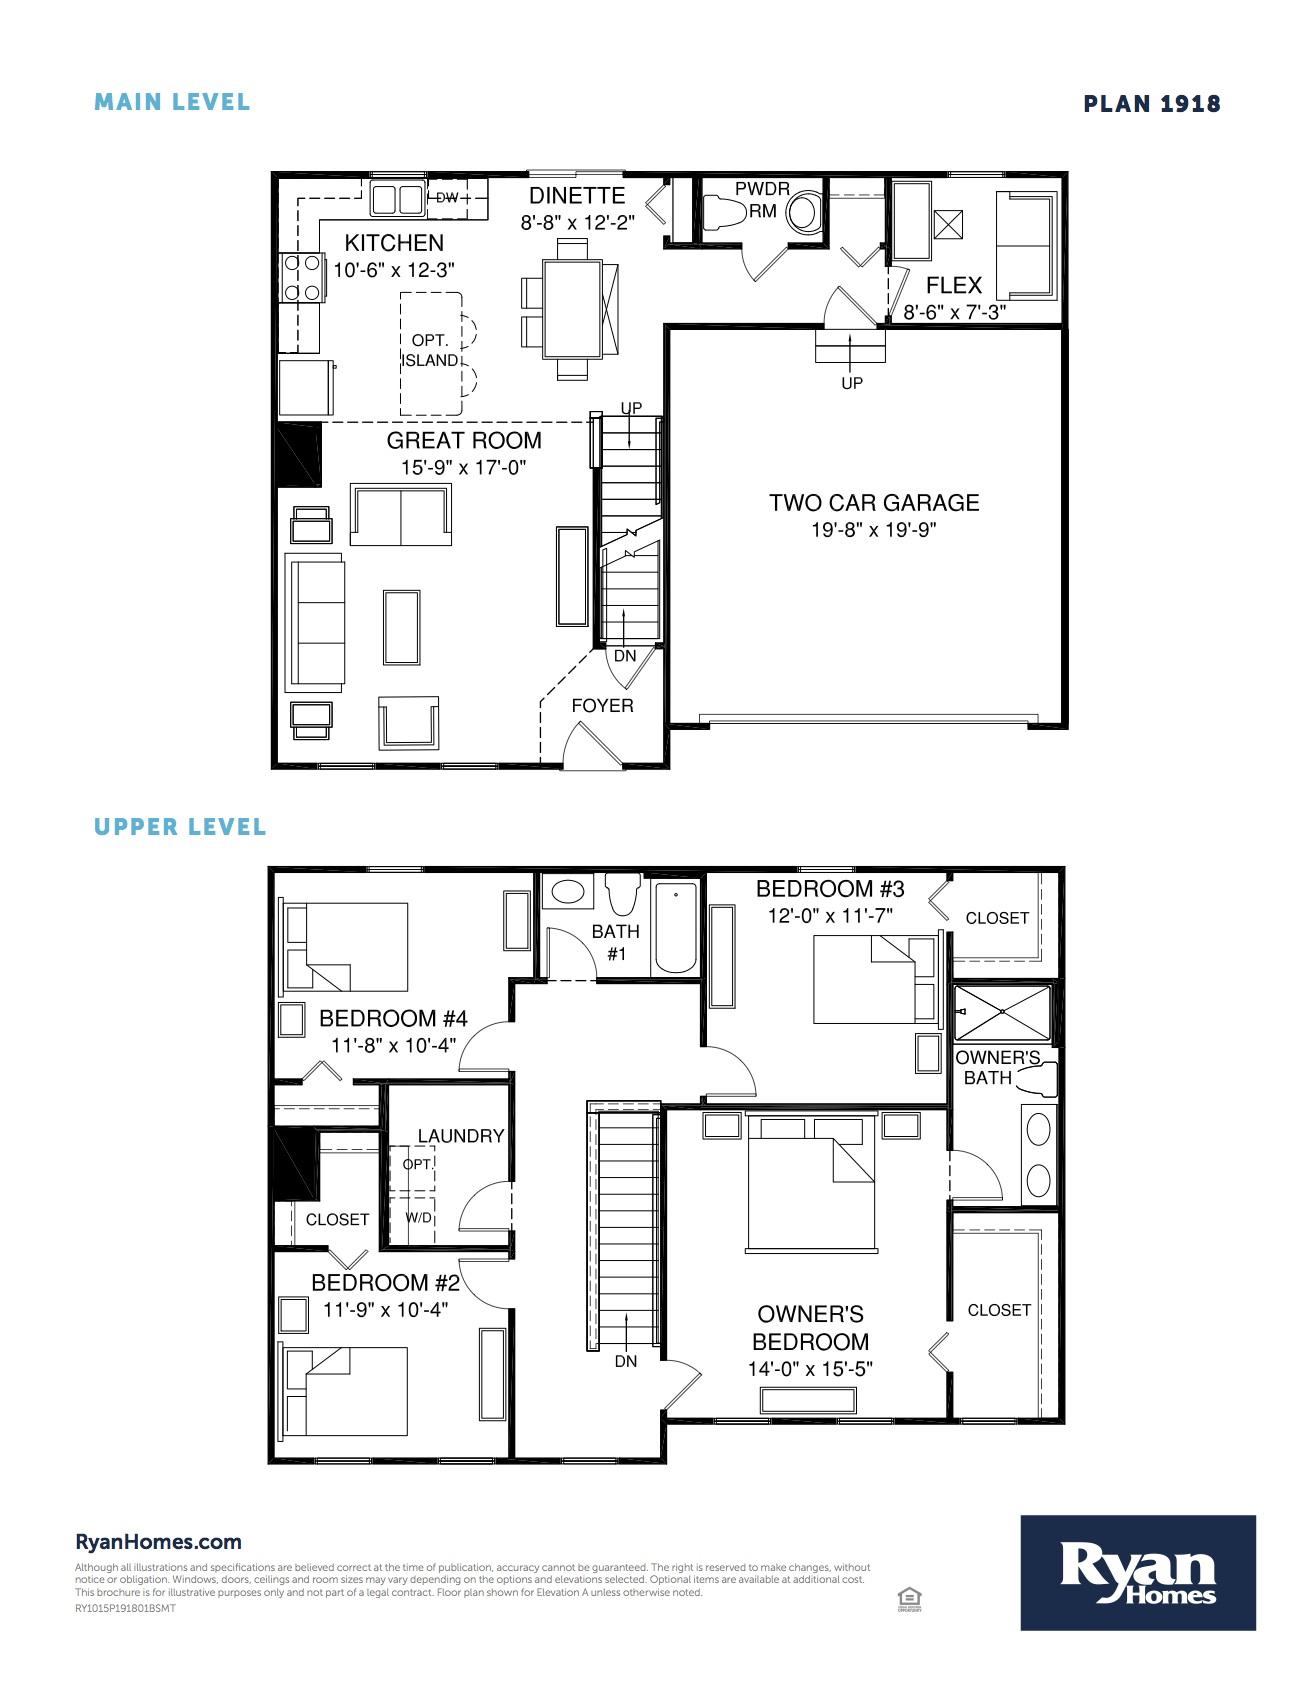 Ryan Homes Rt Floor Plan | Ryan Homes